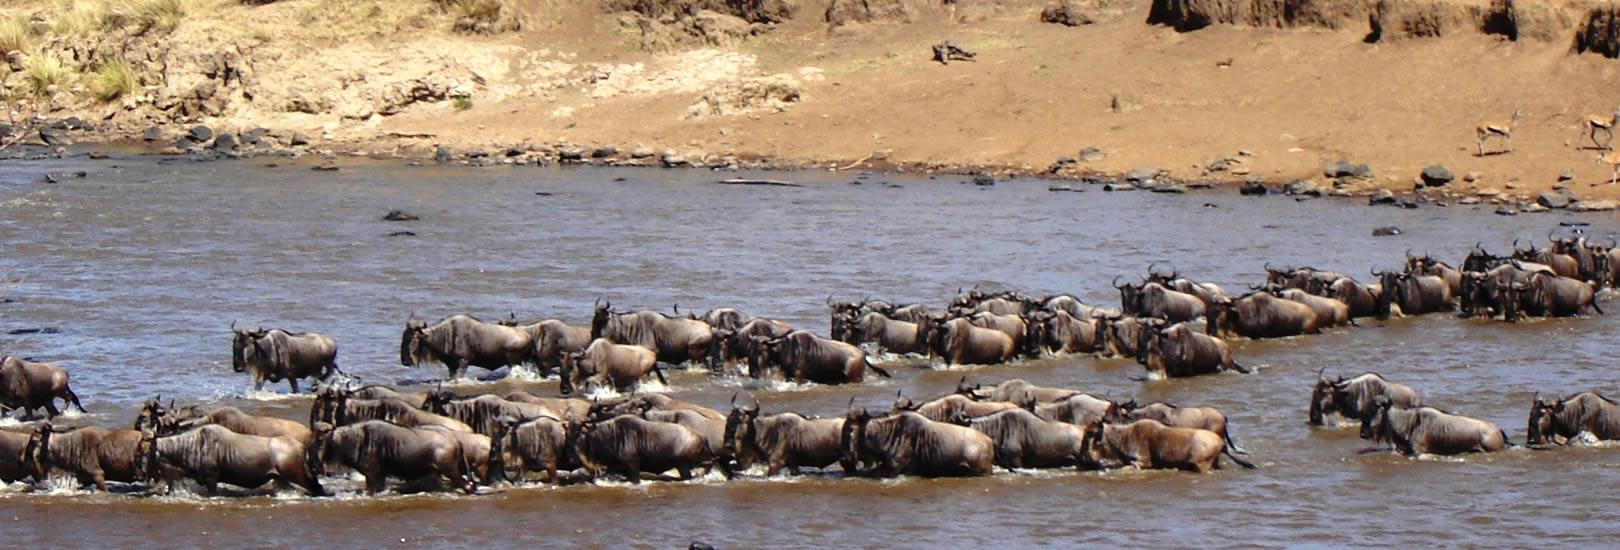 Rhino Safari – 9 Days